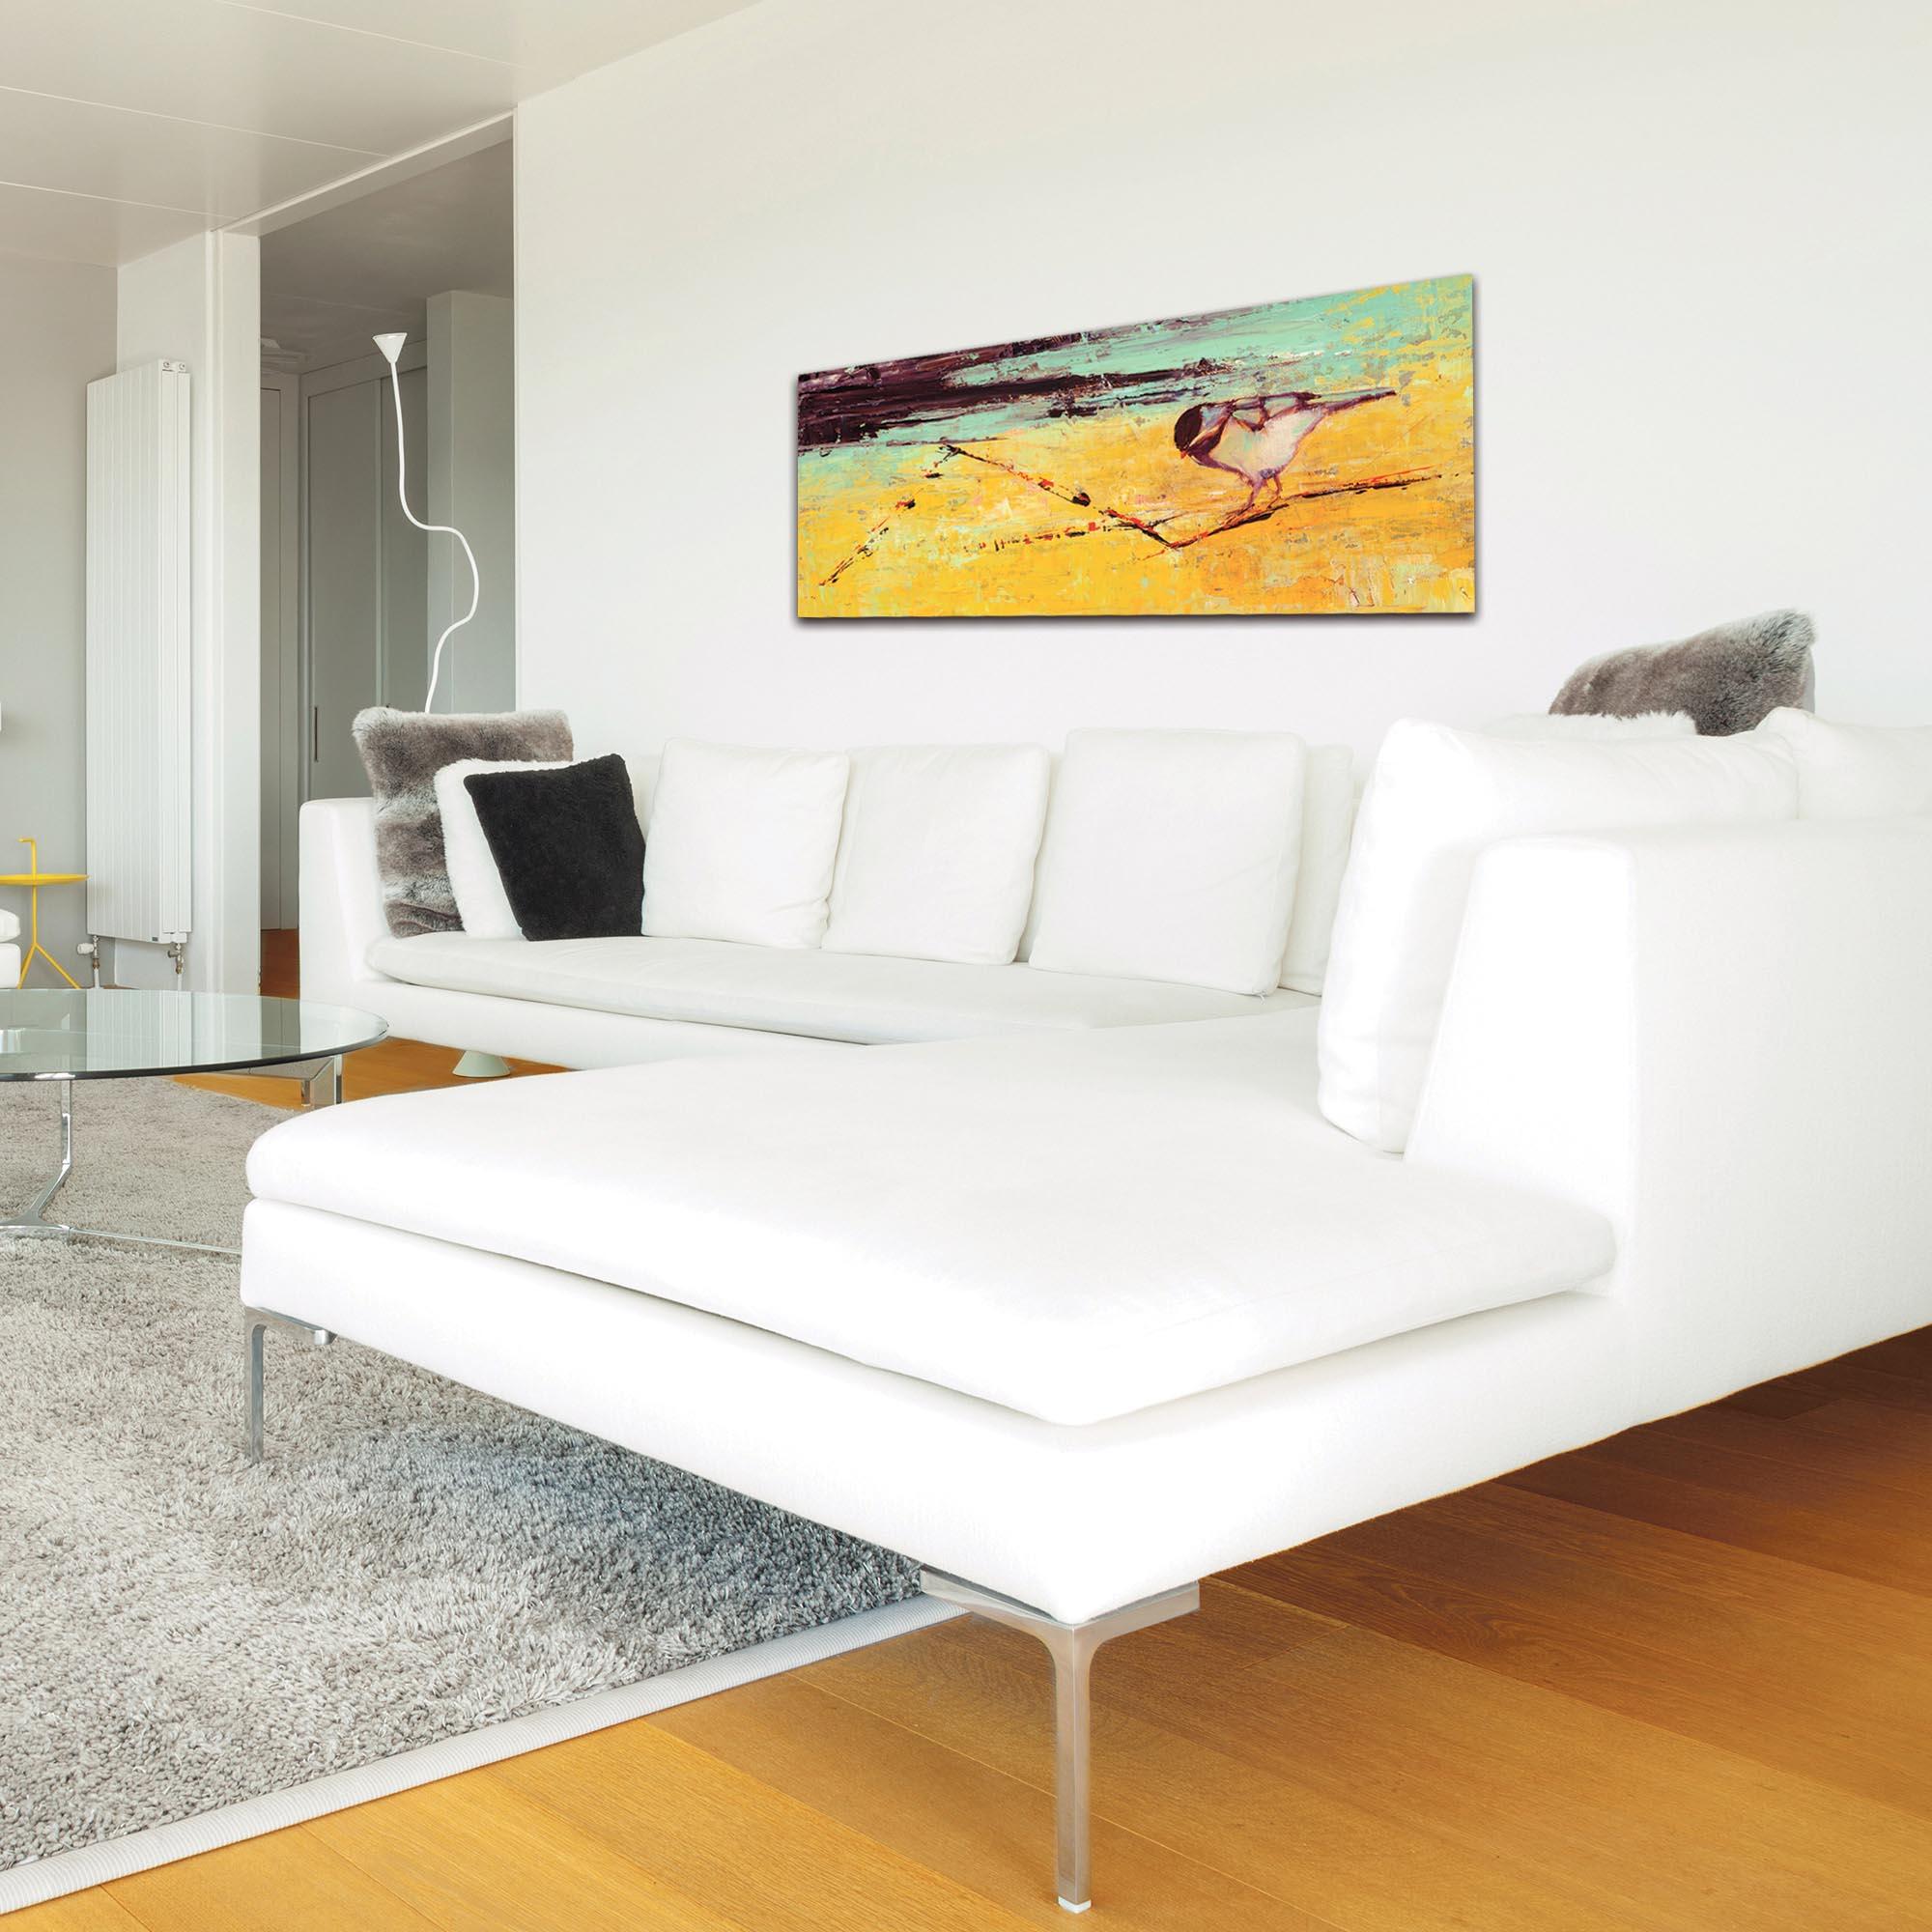 Contemporary Wall Art 'Bird on a Horizon v2' - Urban Birds Decor on Metal or Plexiglass - Lifestyle View